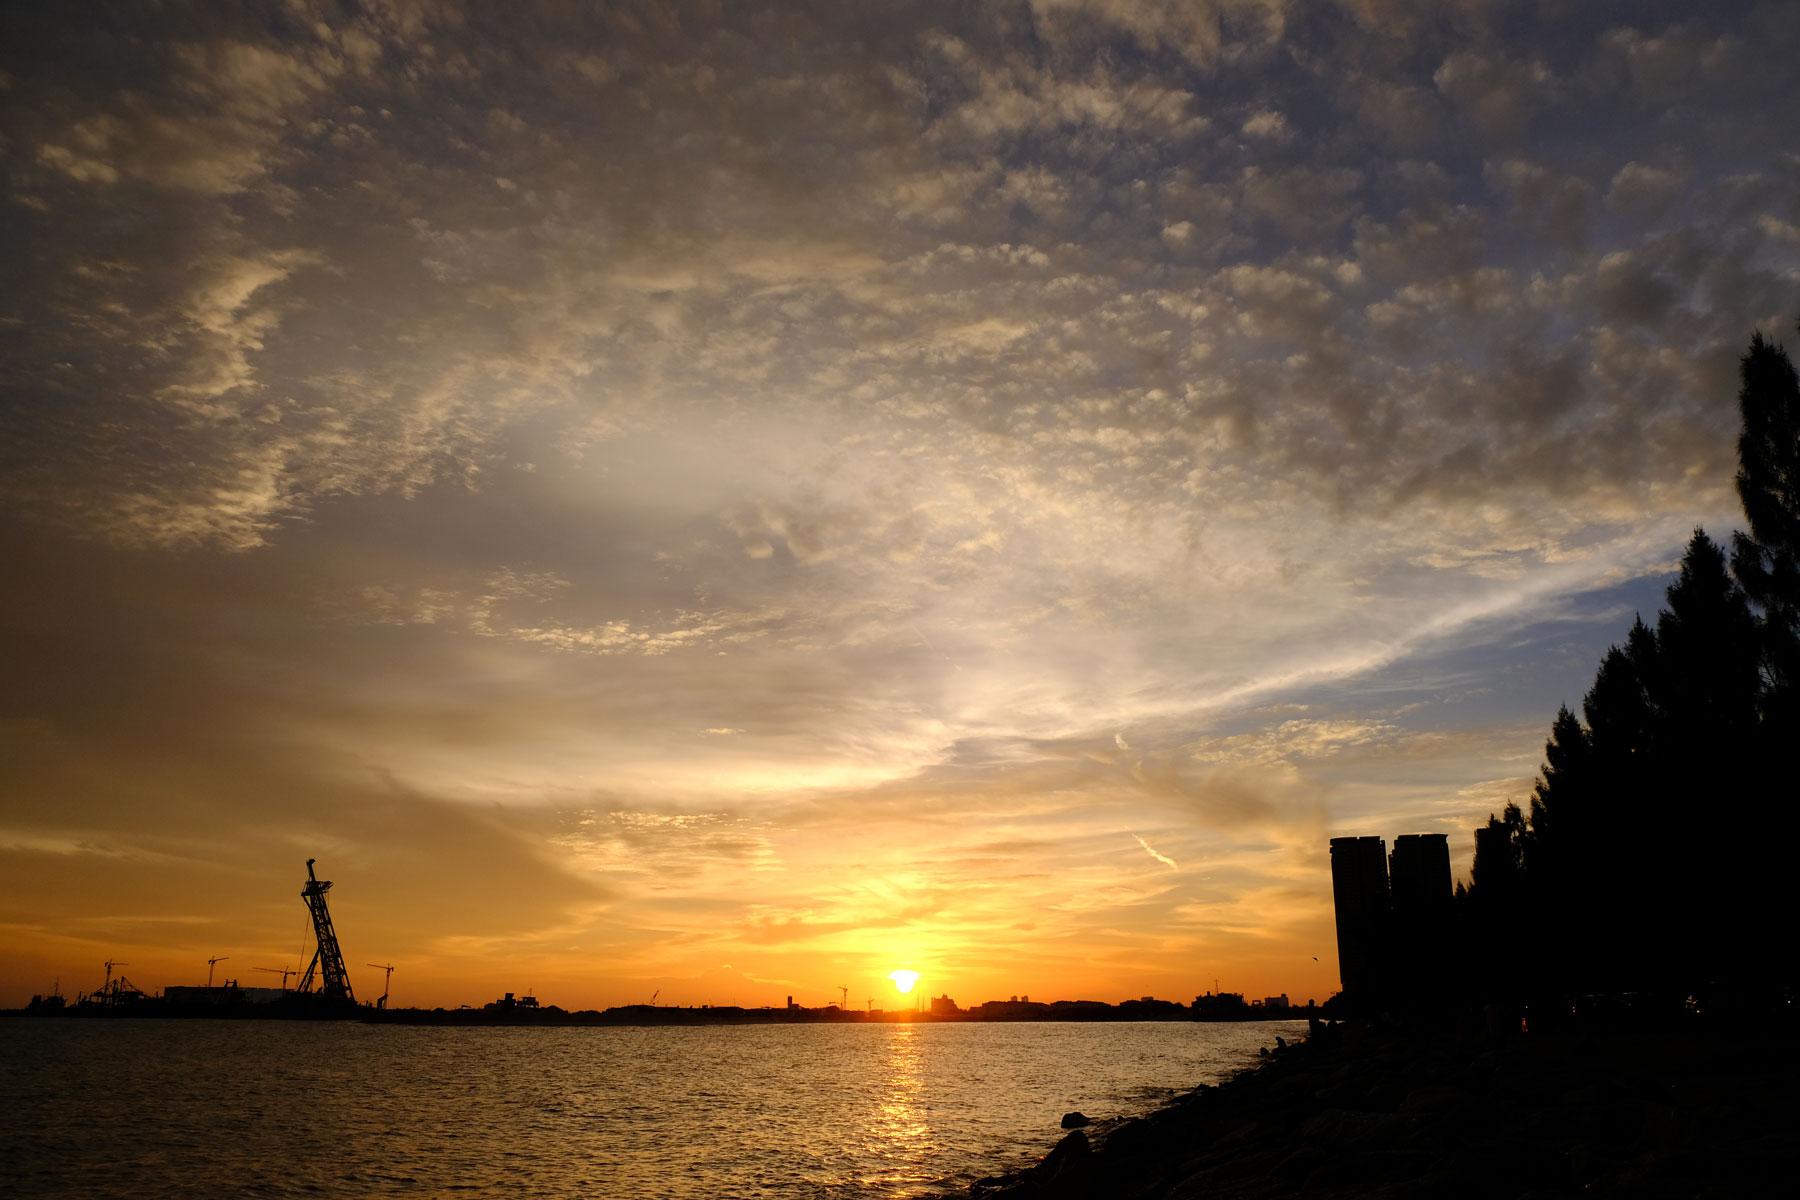 Meerufer in Malakka beim Sonnenuntergang.